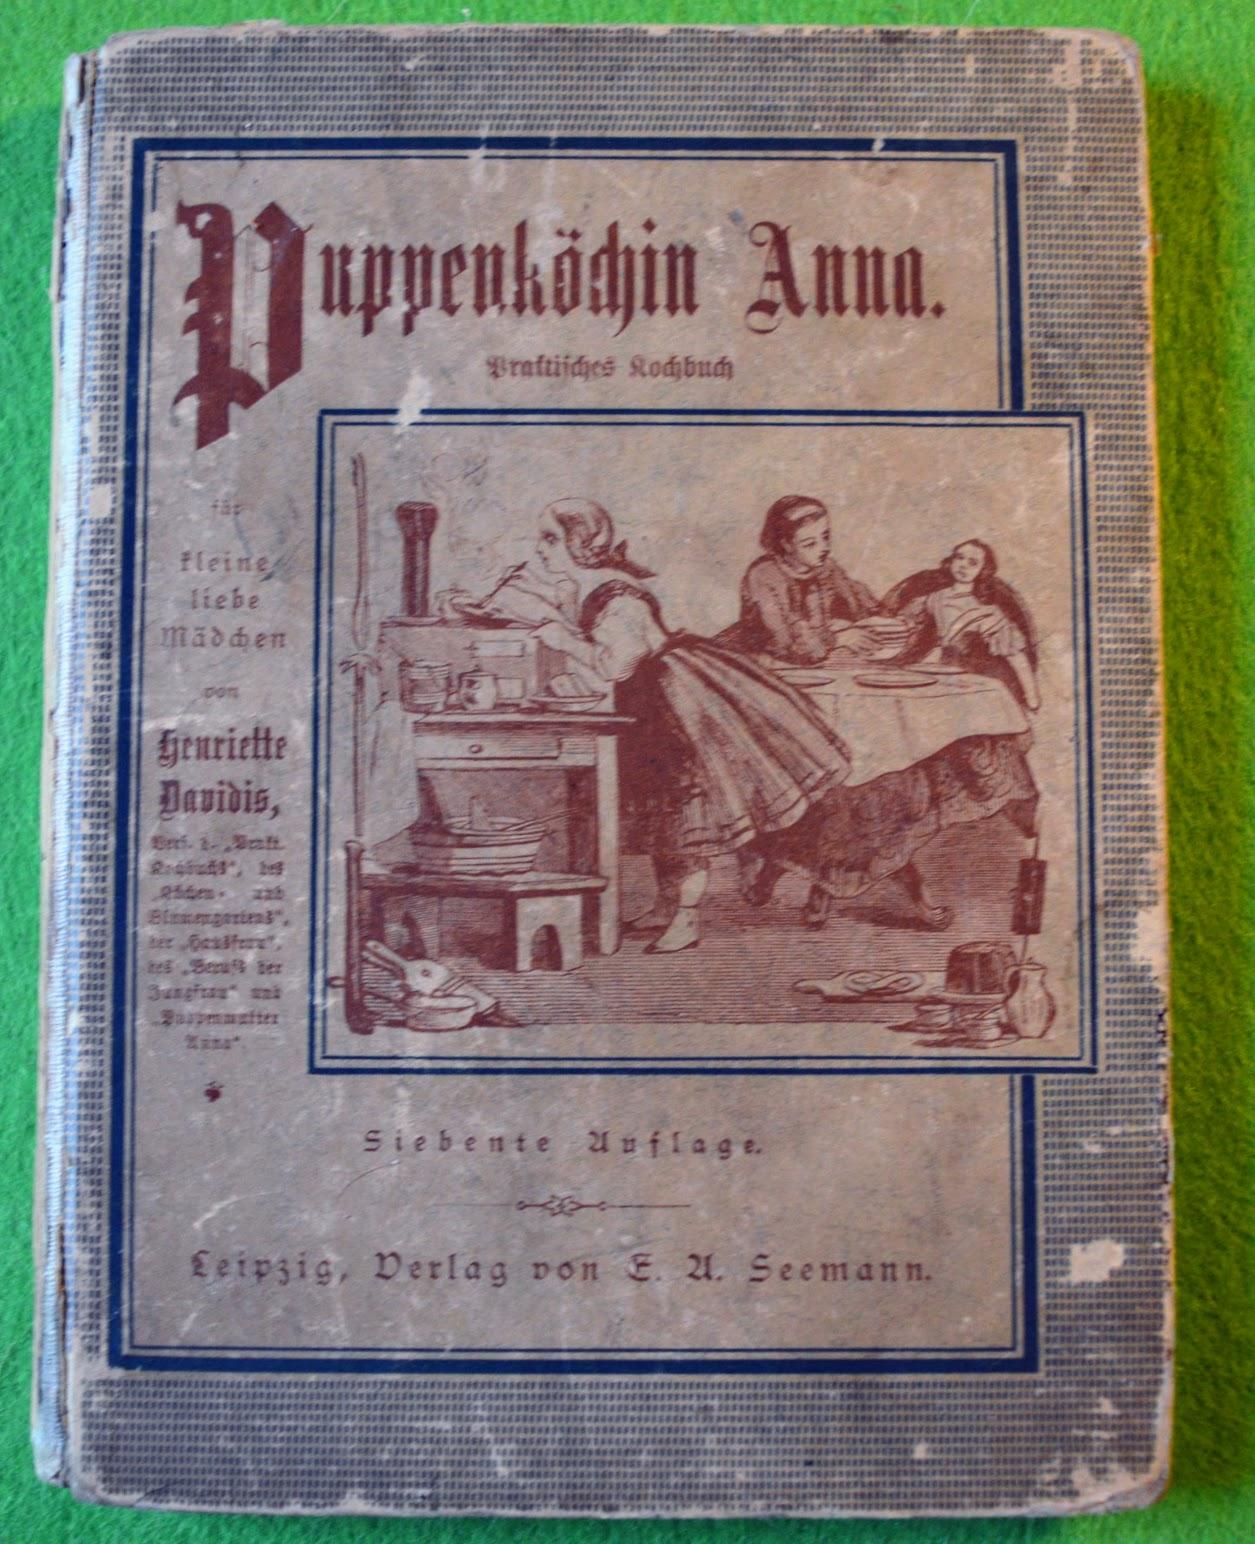 Henriette Davidis - Puppenköchin Anna